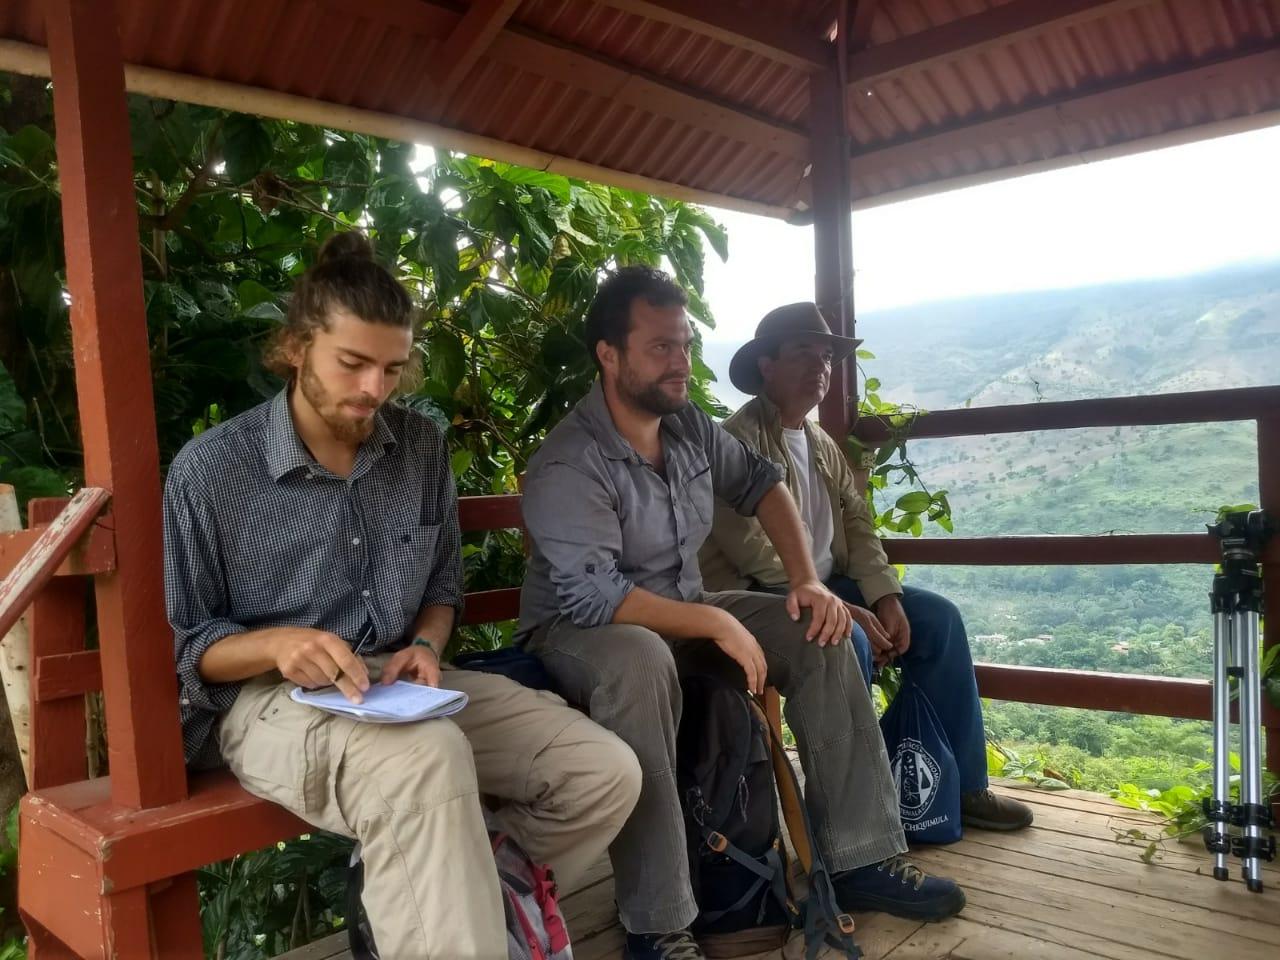 guatemala missione mani tese 2019 (4)